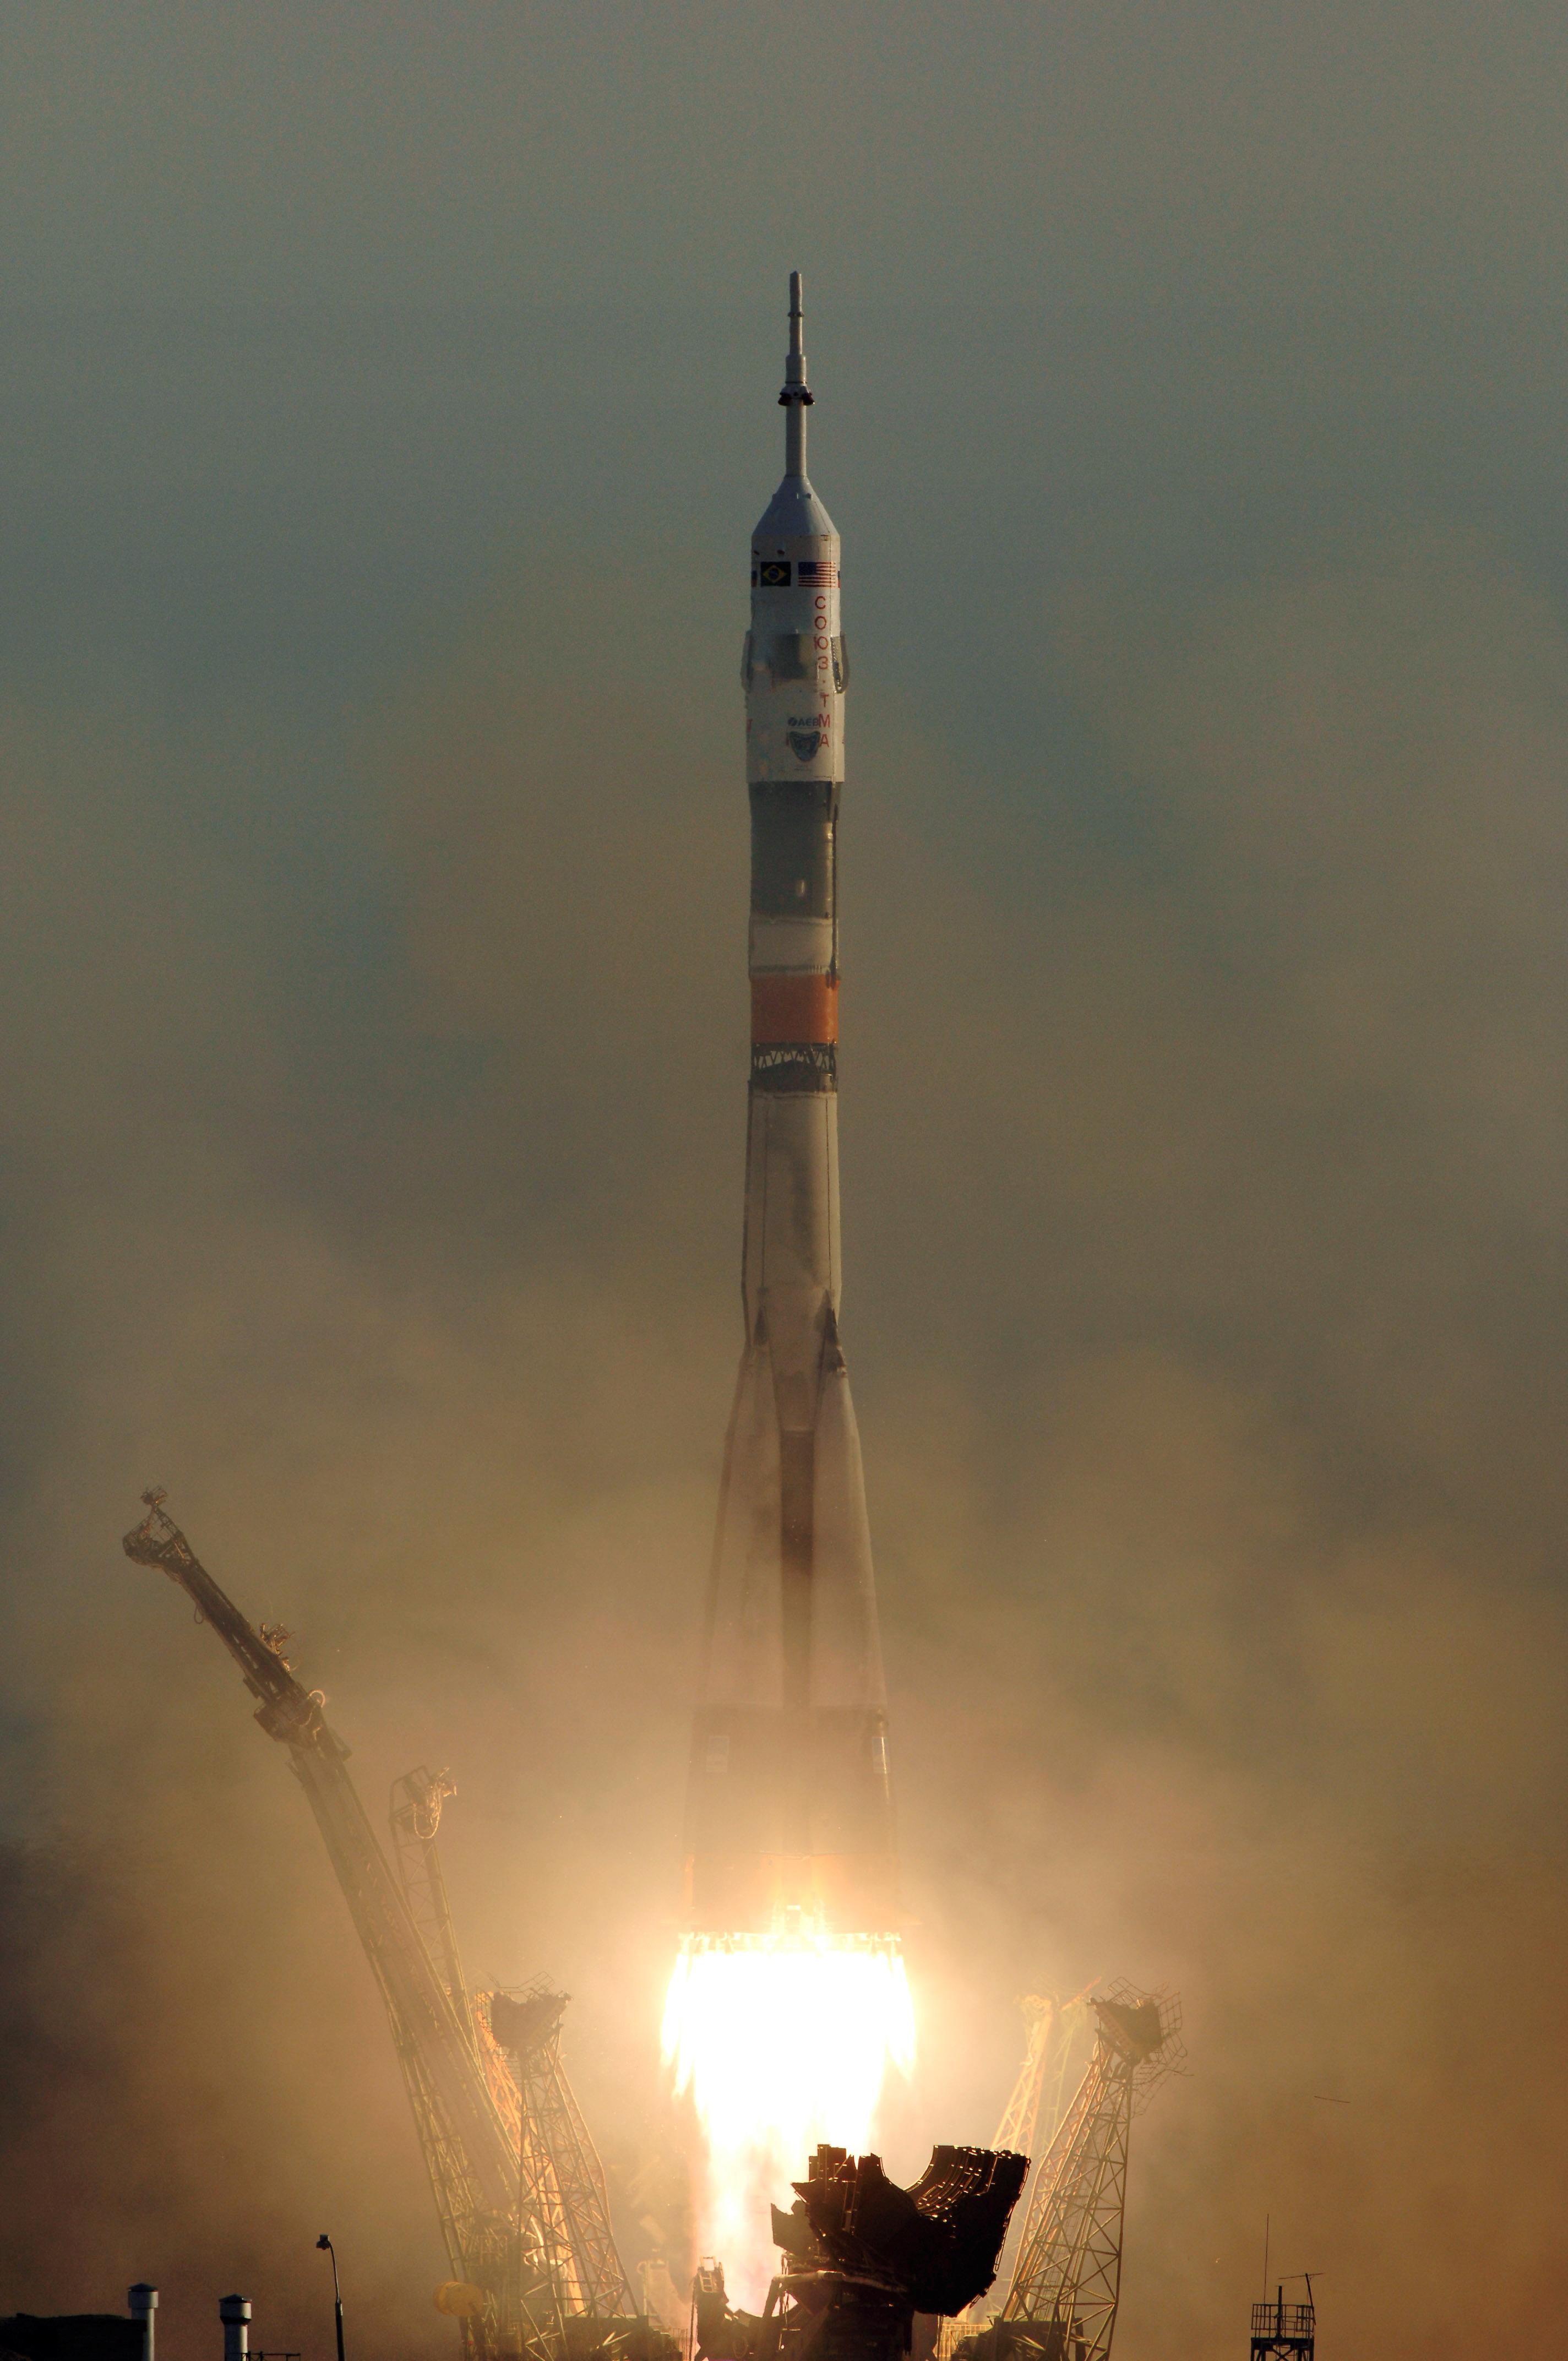 Image result for soyuz tma-8 launch